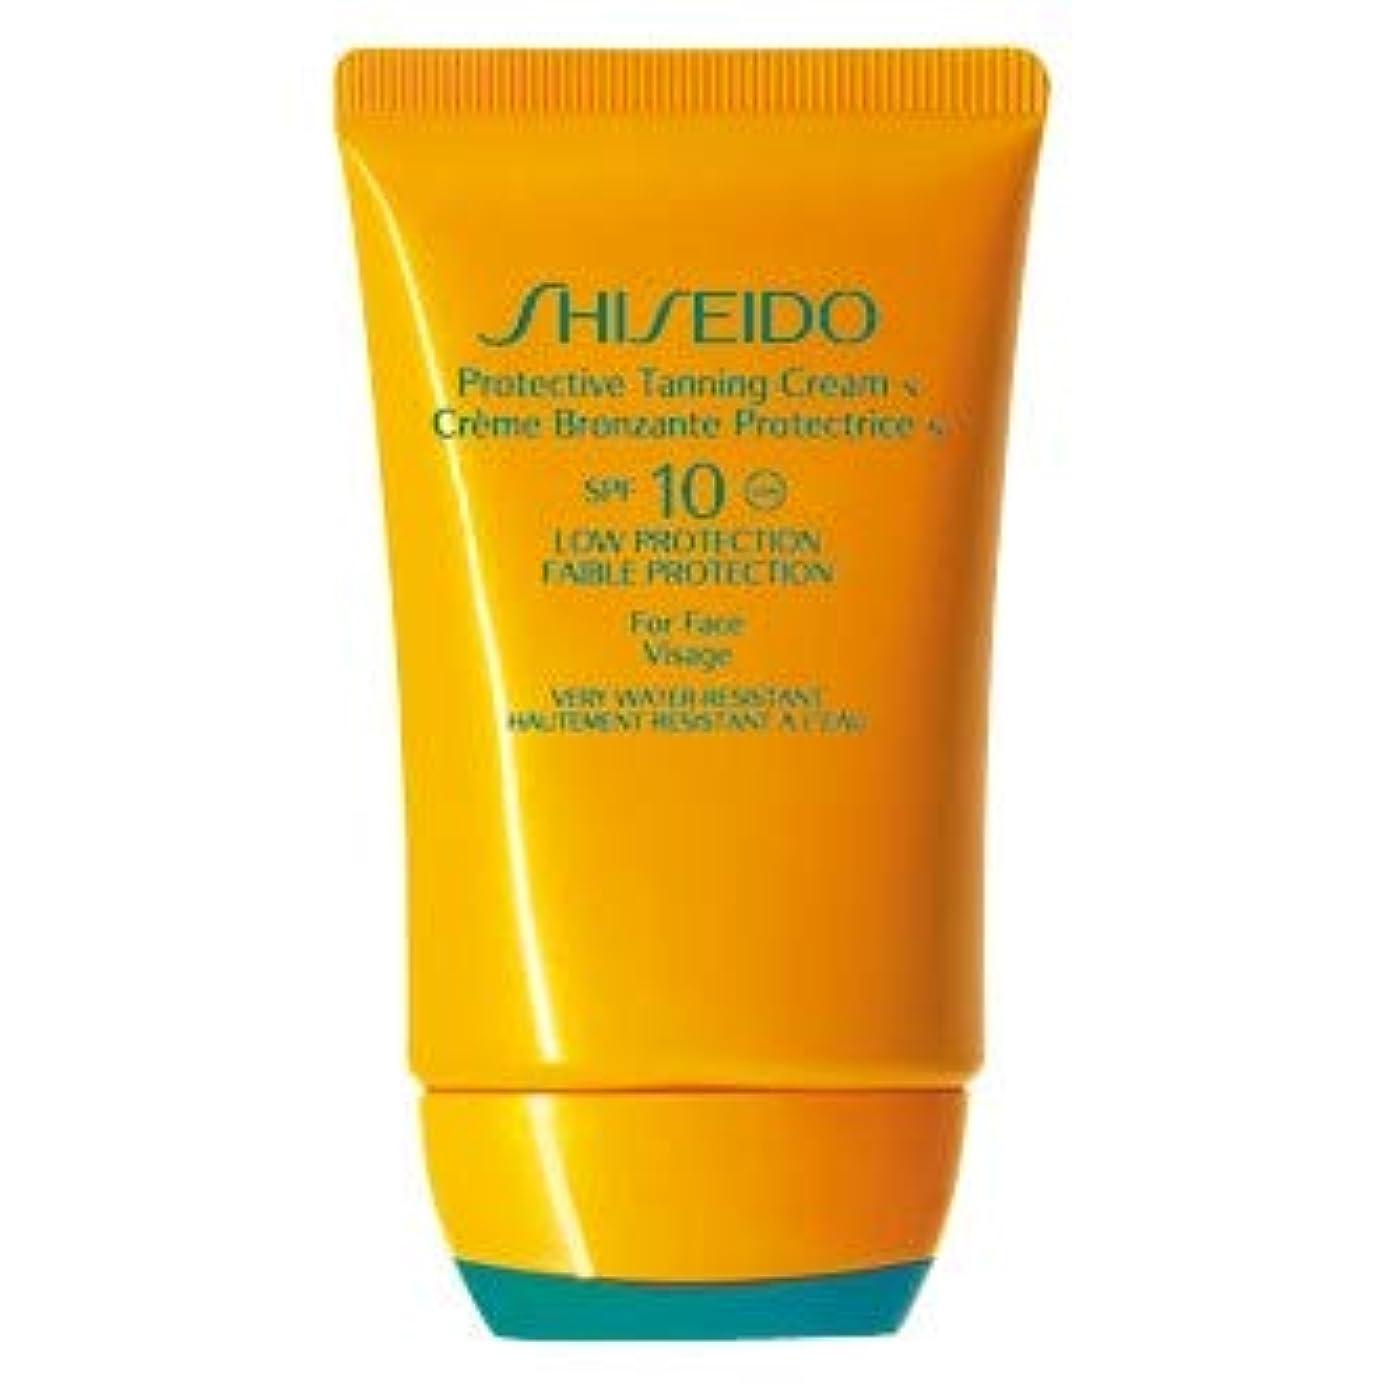 [Shiseido] 資生堂保護日焼けクリームN Spf 10 50ミリリットル - Shiseido Protective Tanning Cream N Spf 10 50ml [並行輸入品]